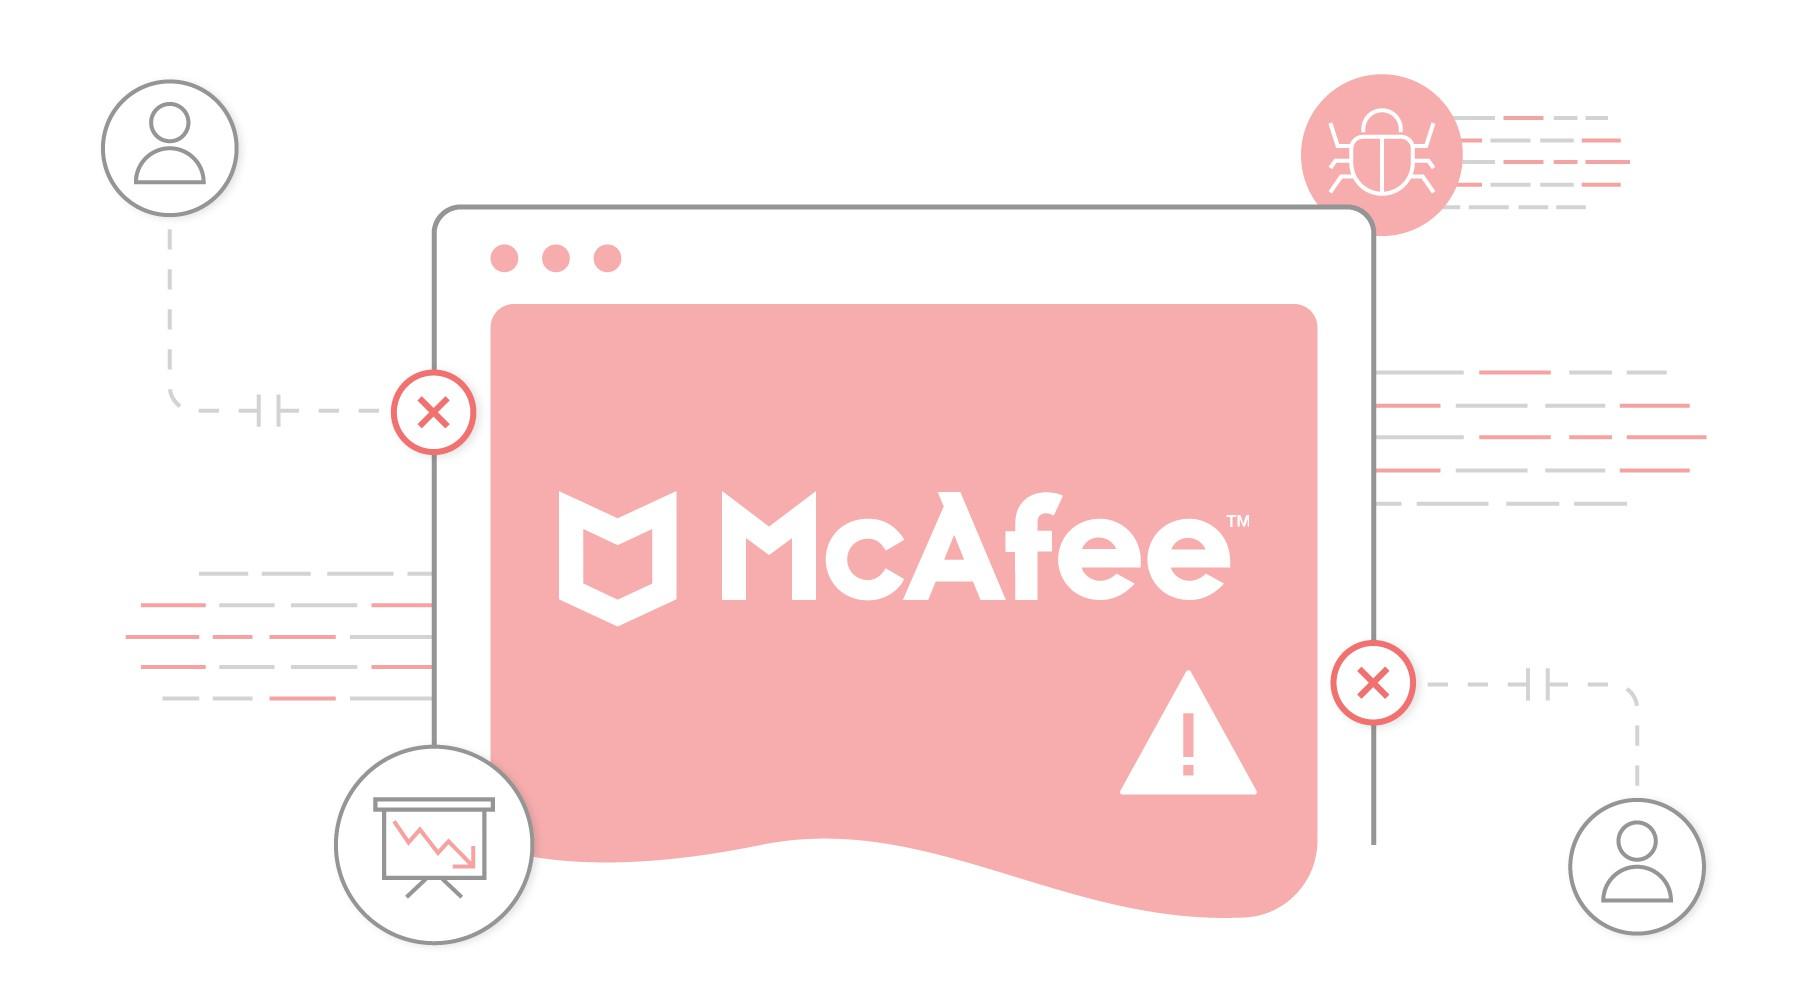 McAfee Labs พบมัลแวร์บน macOS เพิ่มขึ้นถึง 50% ในไตรมาสที่ผ่านมา